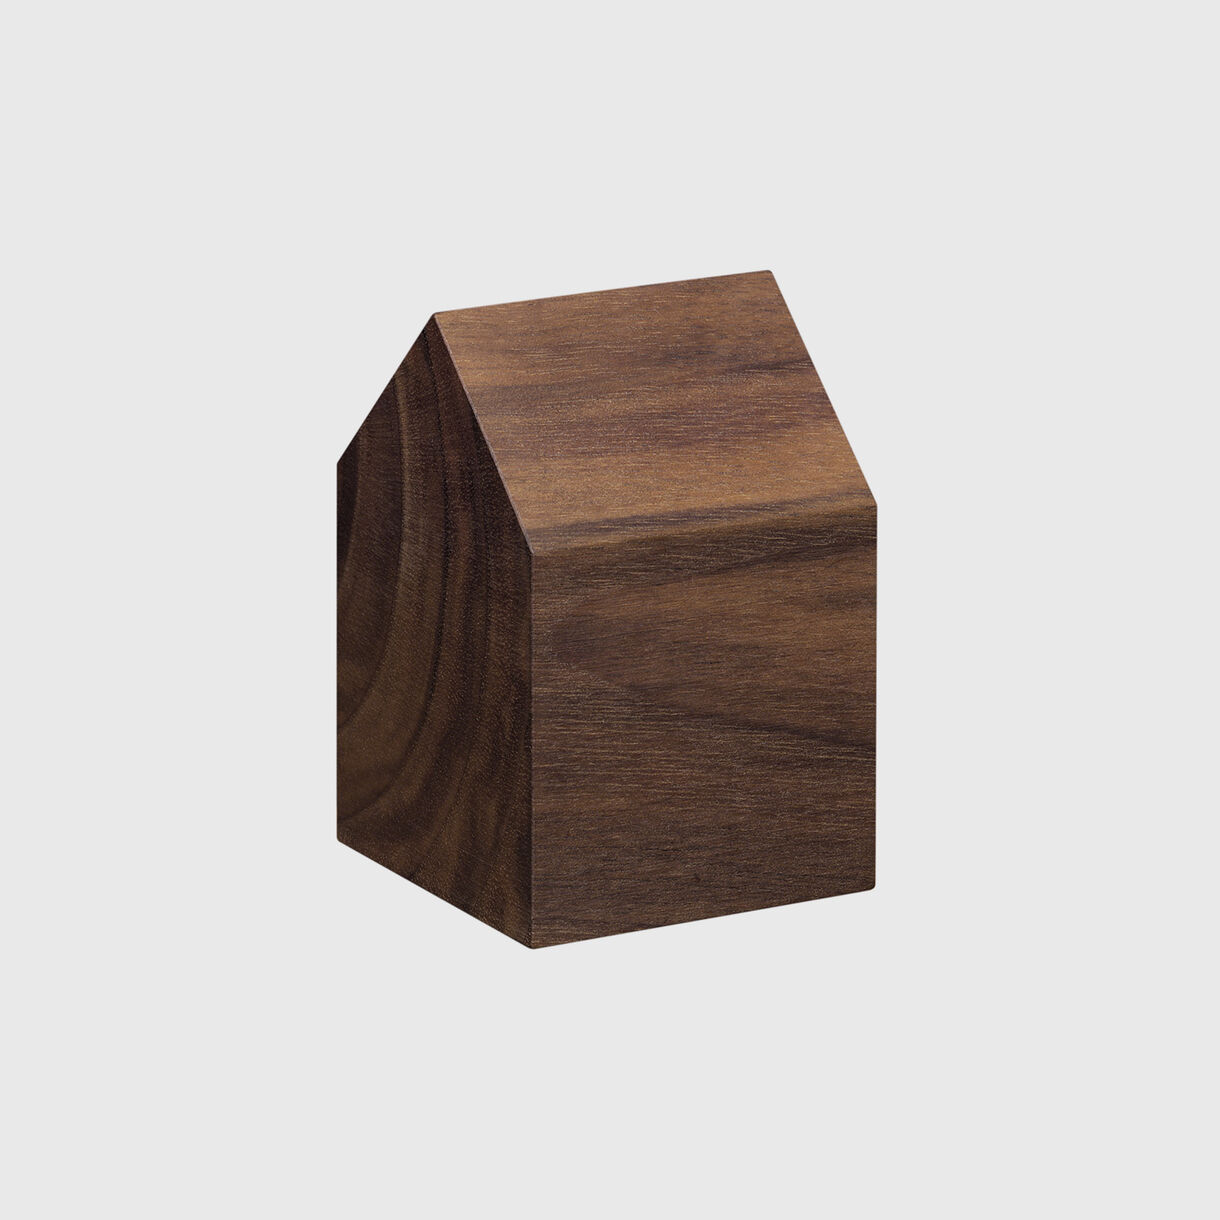 Haus Paper Weight, Saddle Small, European Walnut